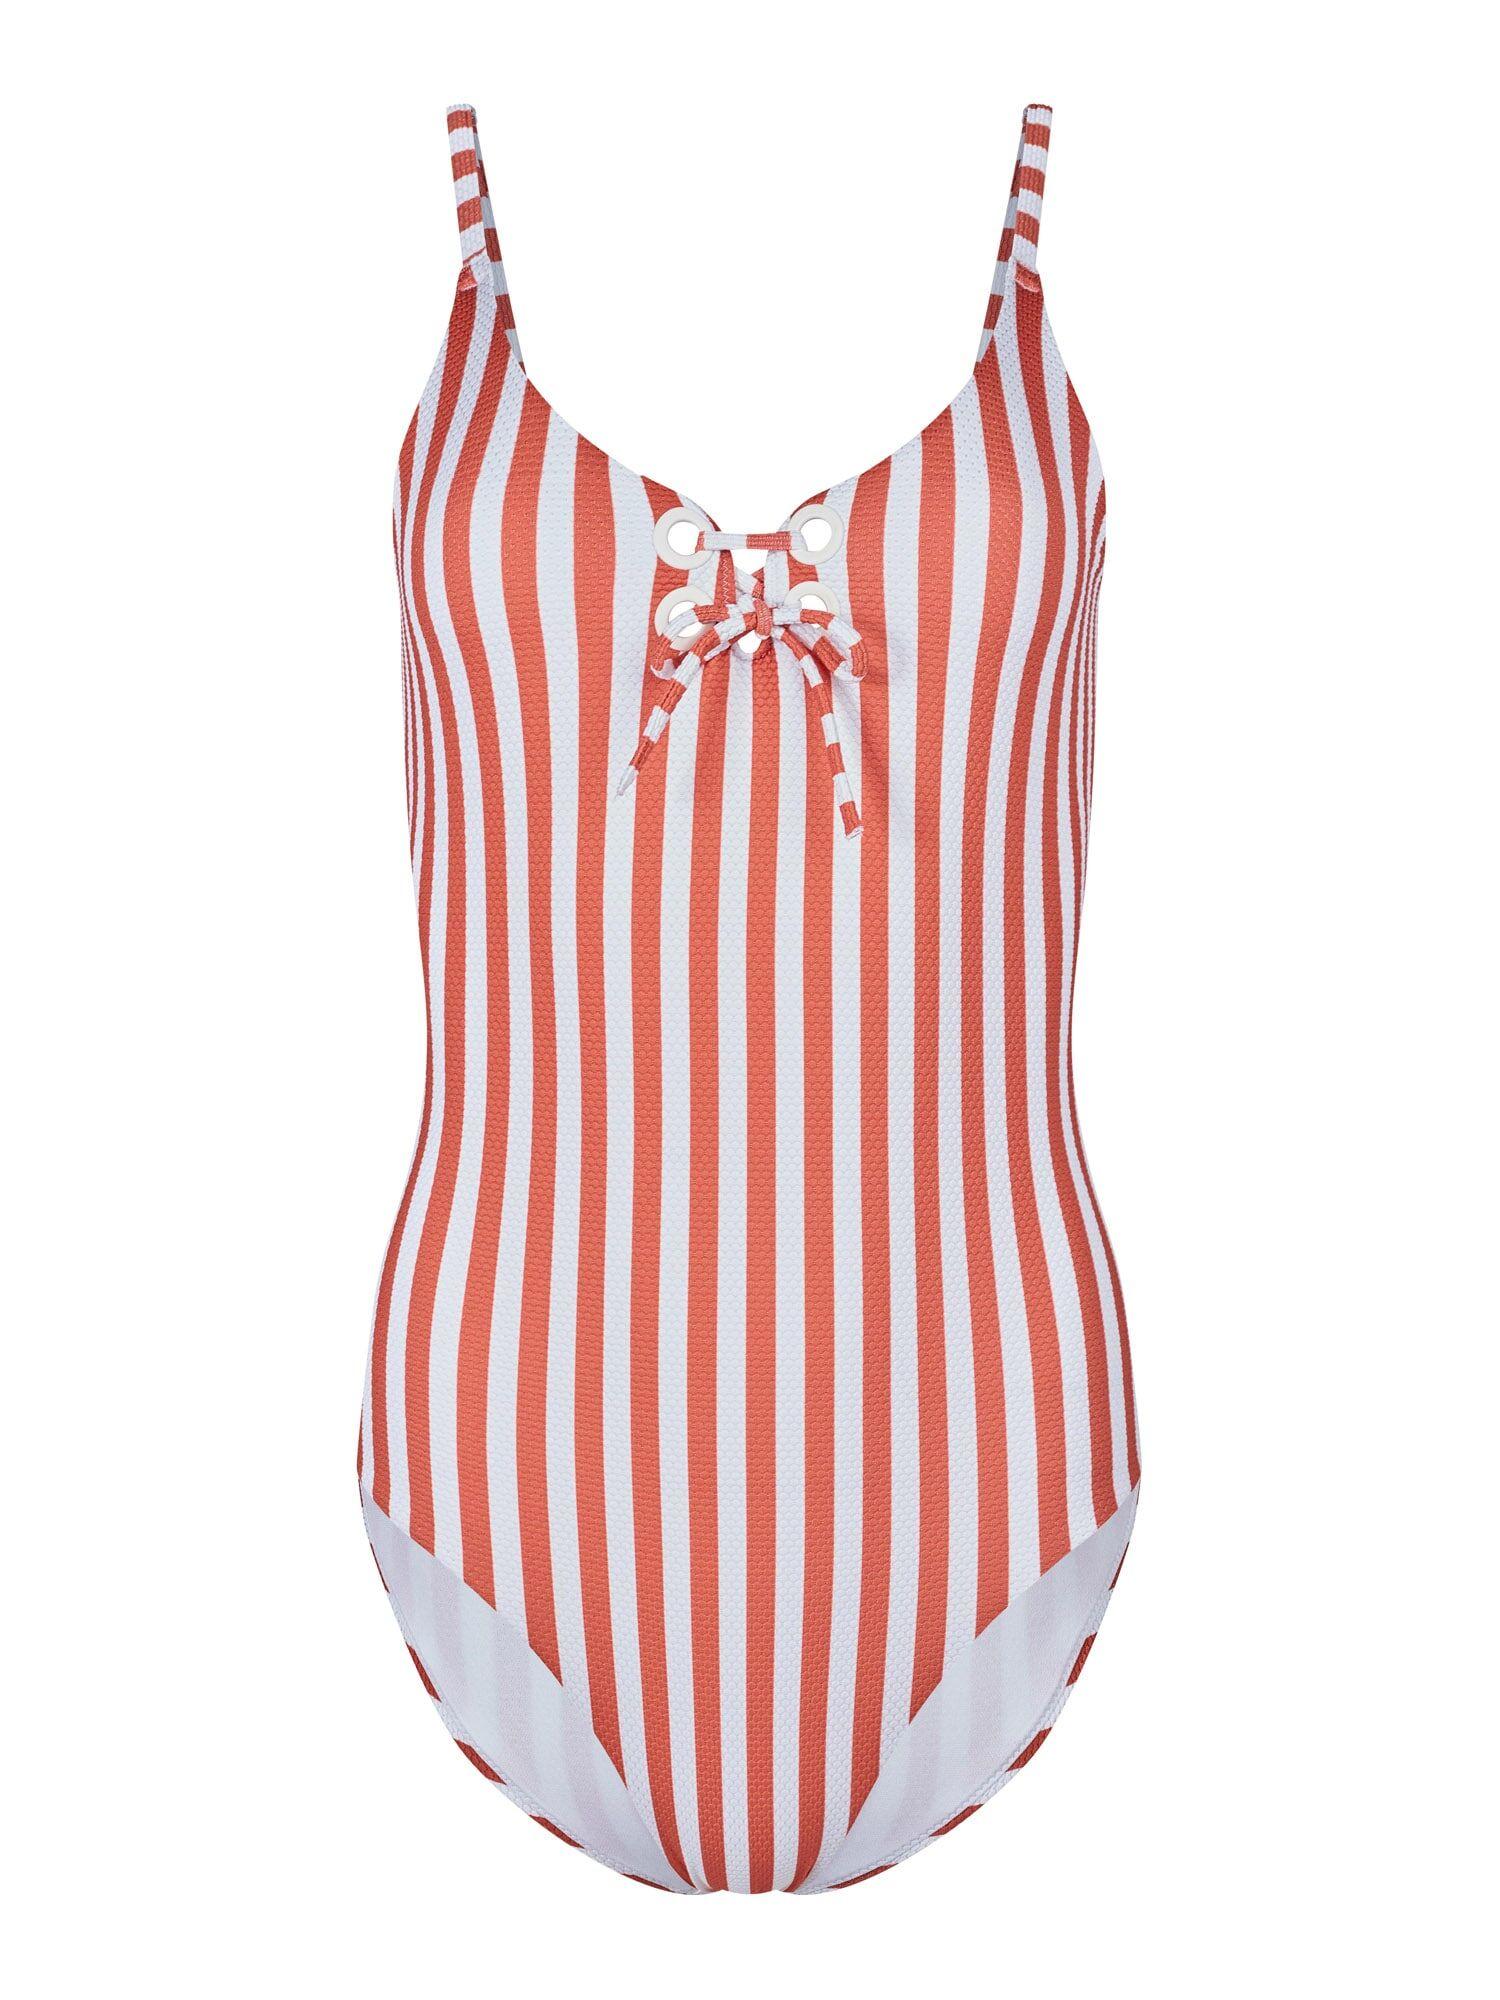 Skiny Maillot de bain 'Surf Girl'  - Orange, Blanc - Taille: 36 - female